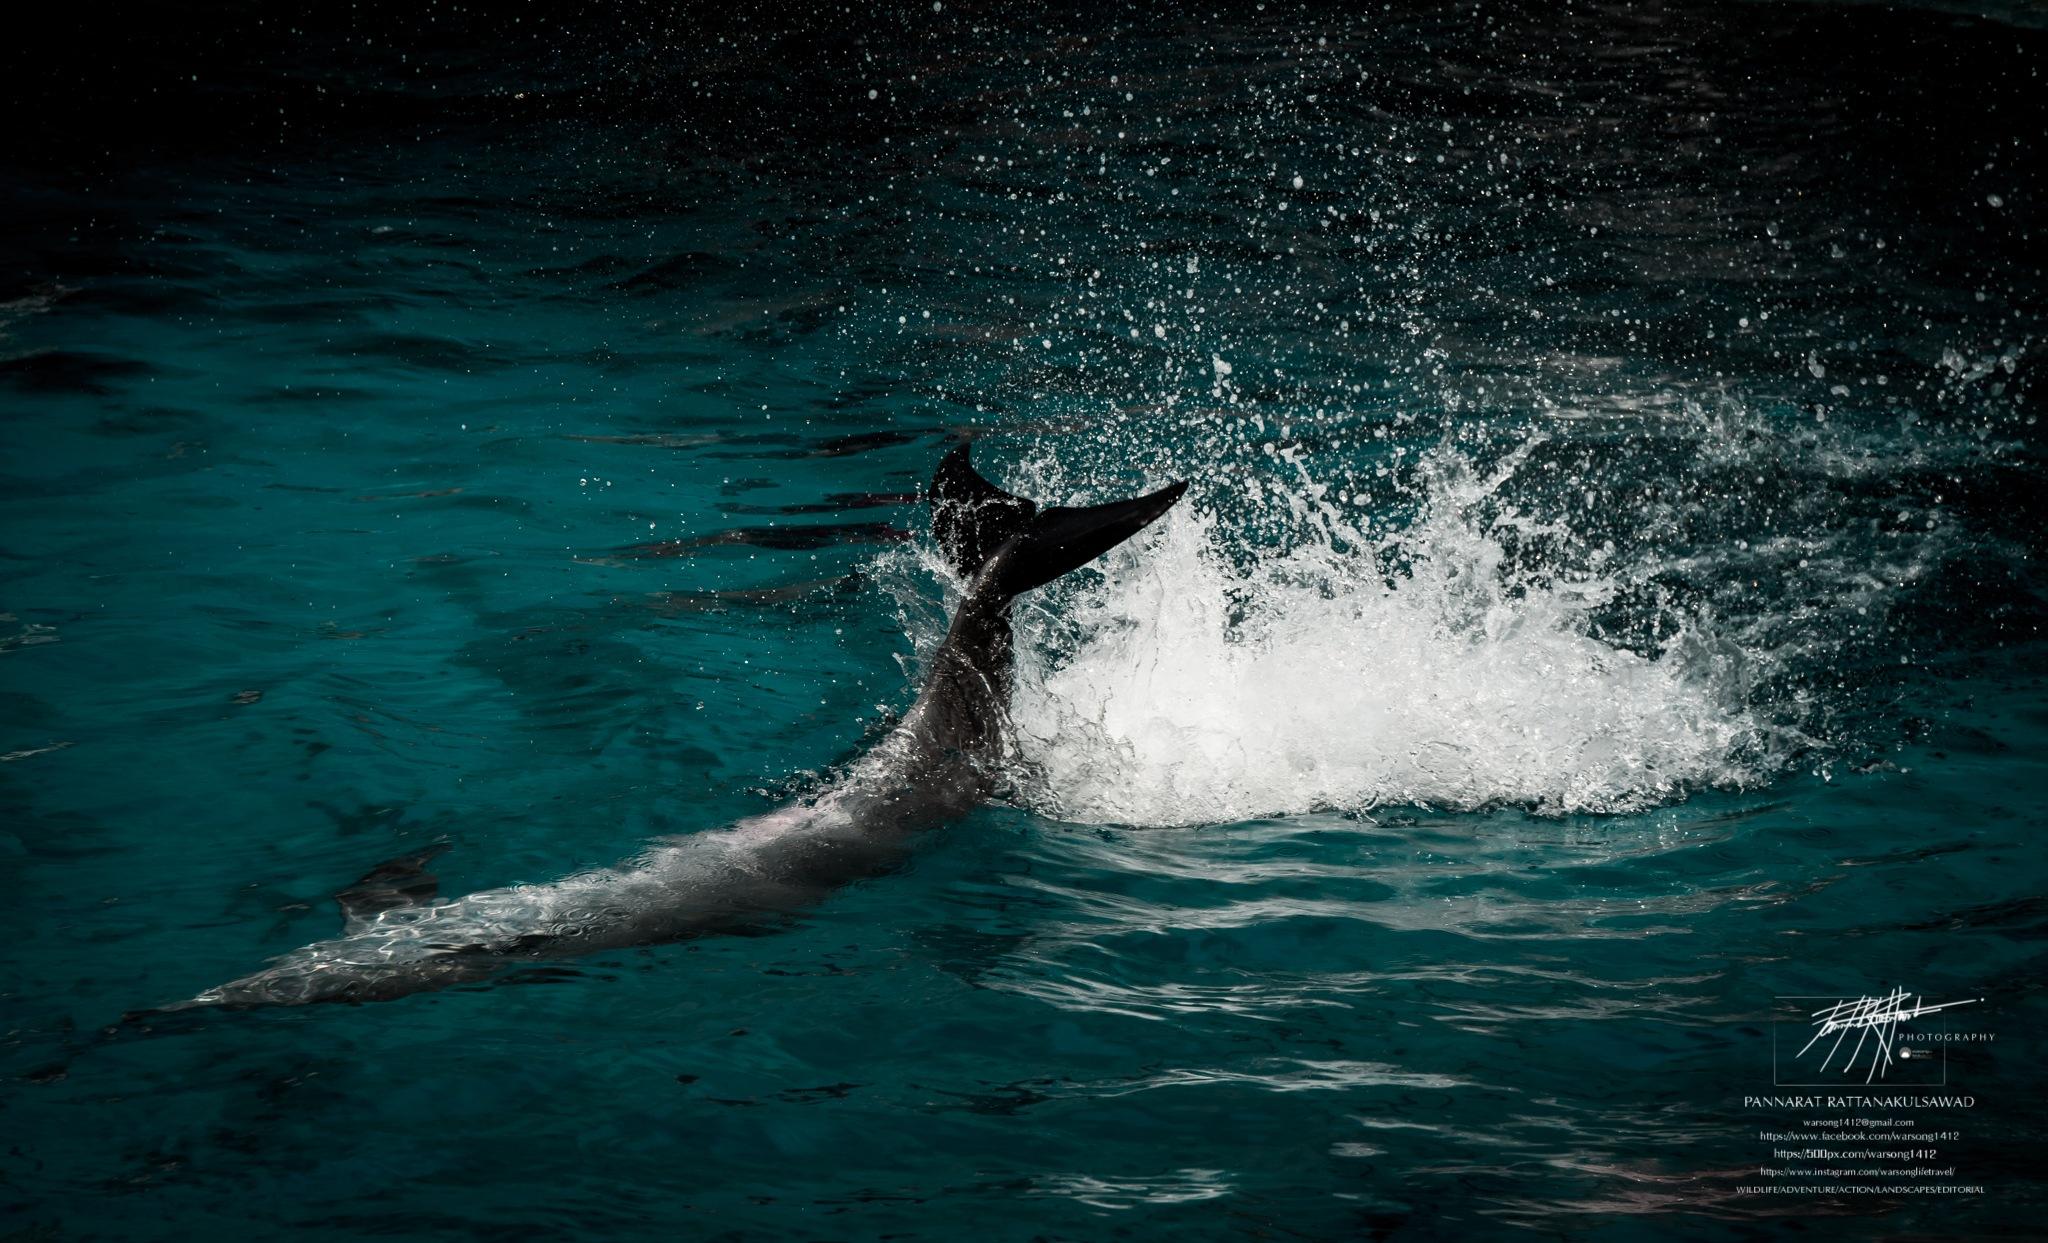 Dolphin Action movement of motion. by Kumpa P. Rattanakulsawad